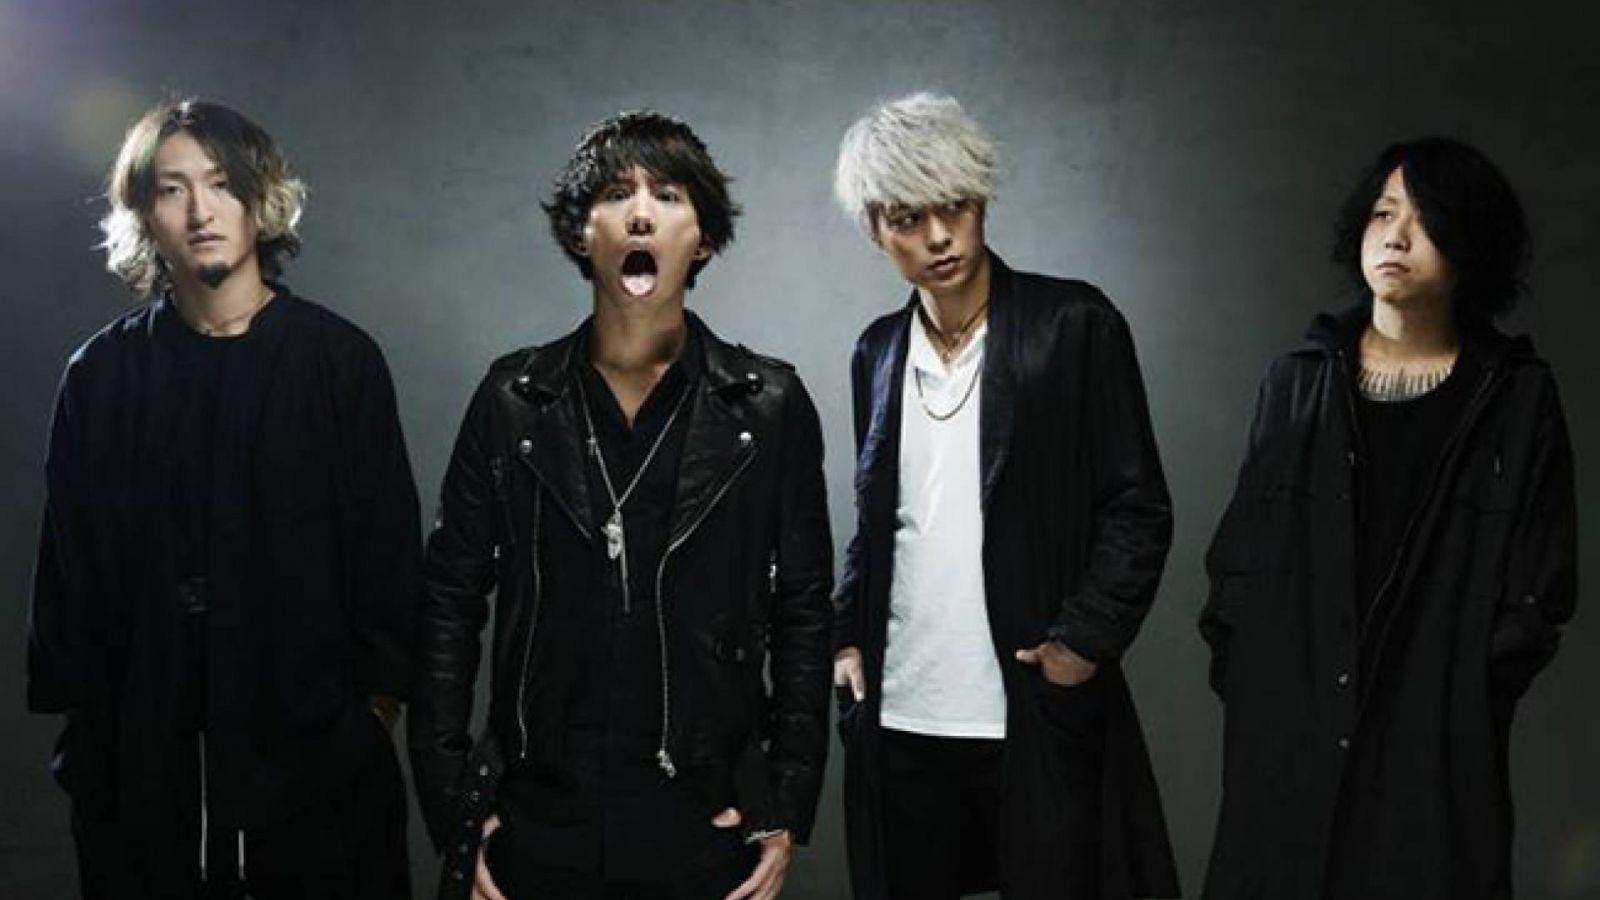 ONE OK ROCK veranstalten Nordamerikatour © ONE OK ROCK, All Rights Reserved